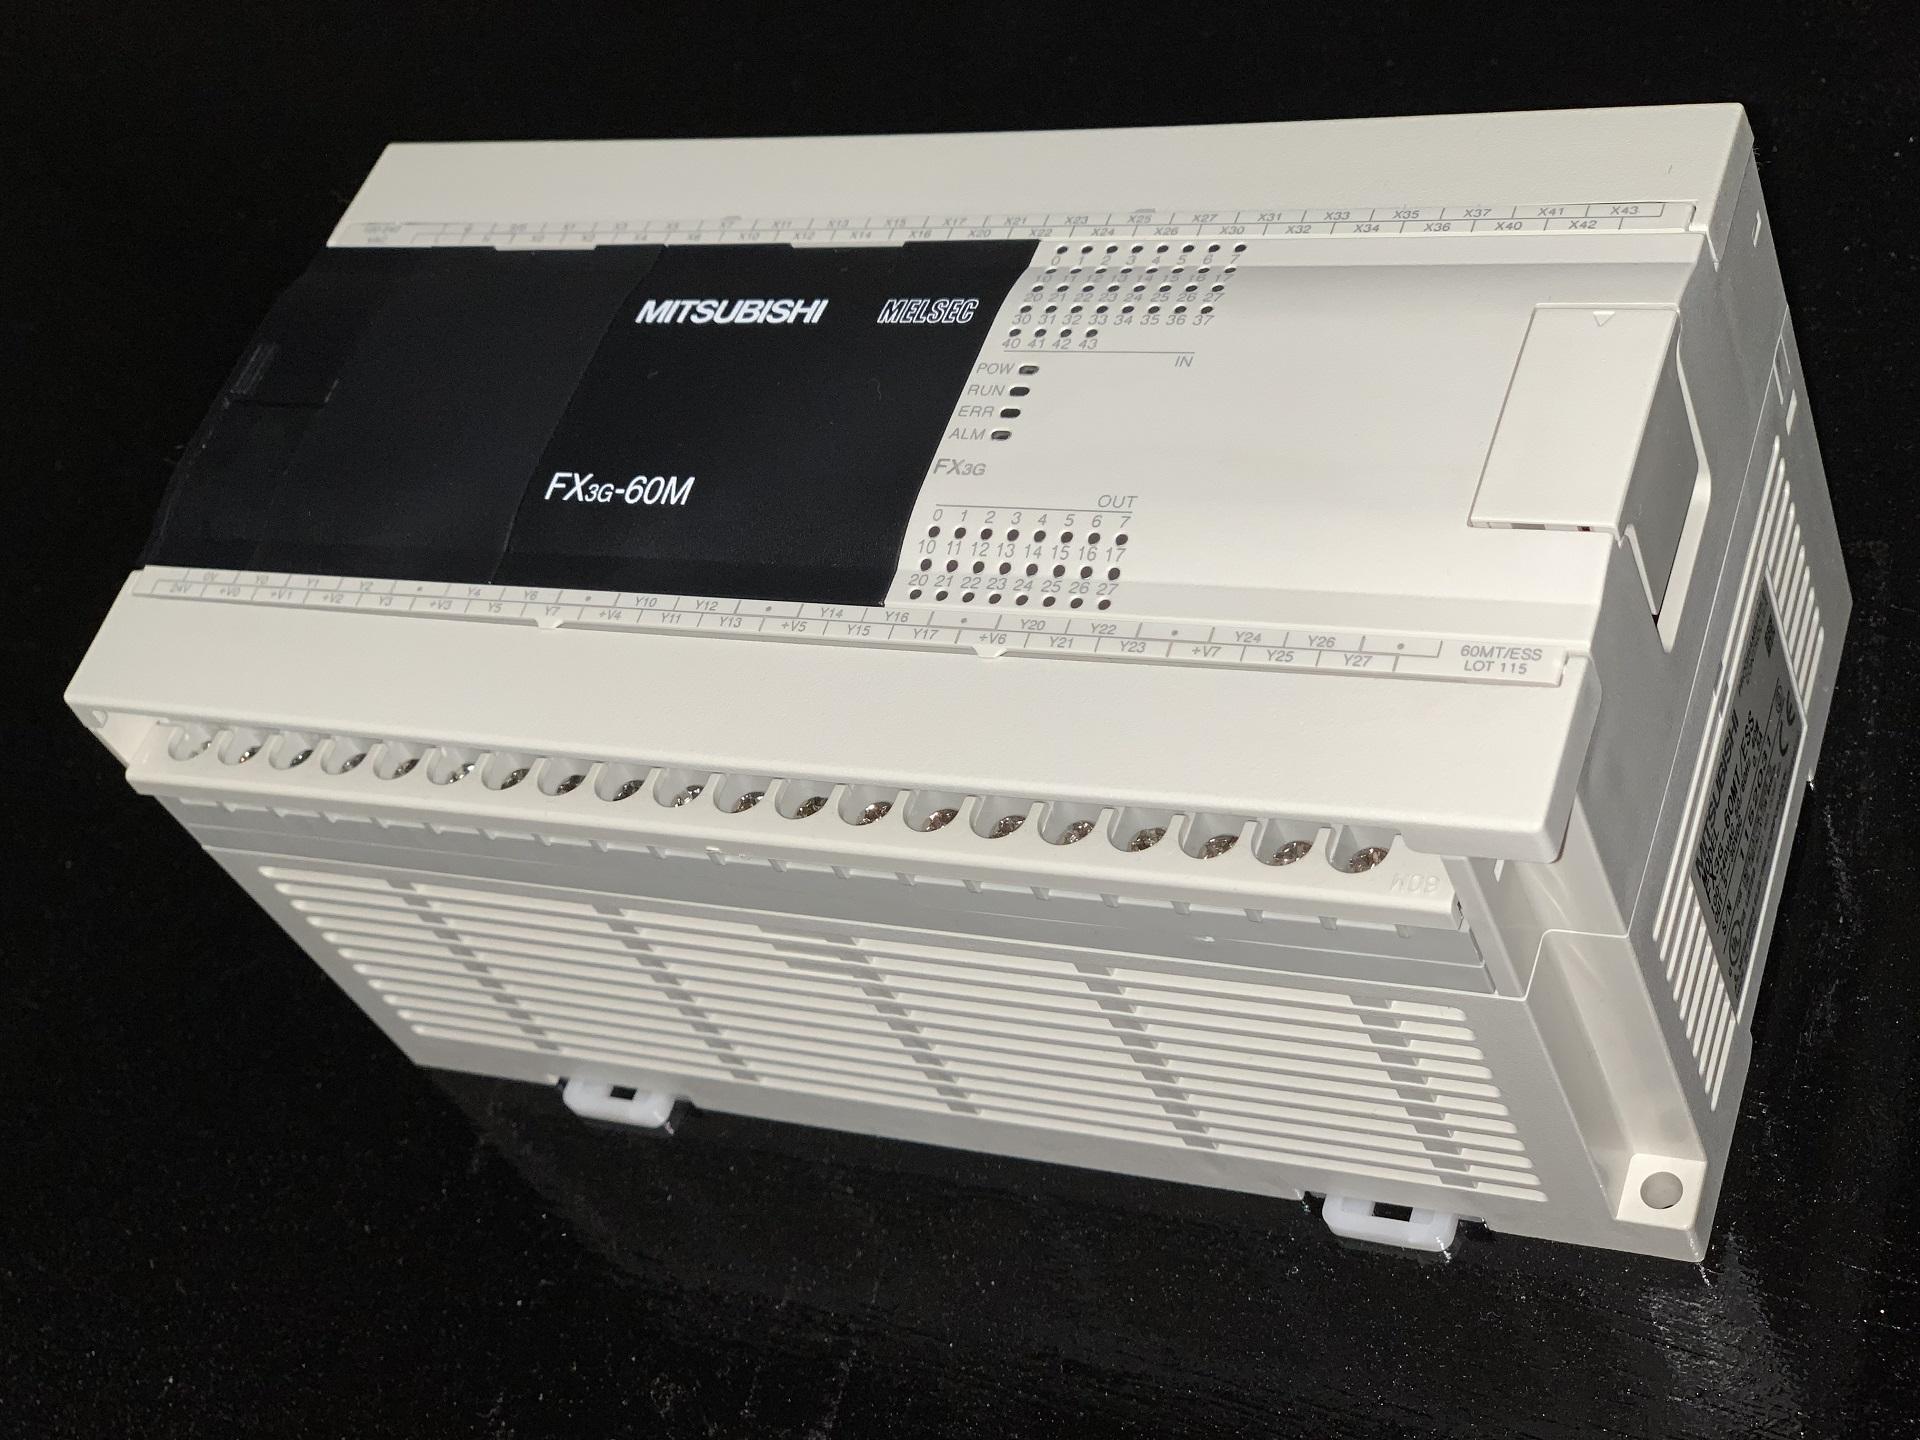 23_三菱電機製のPLC:FX3G-60M